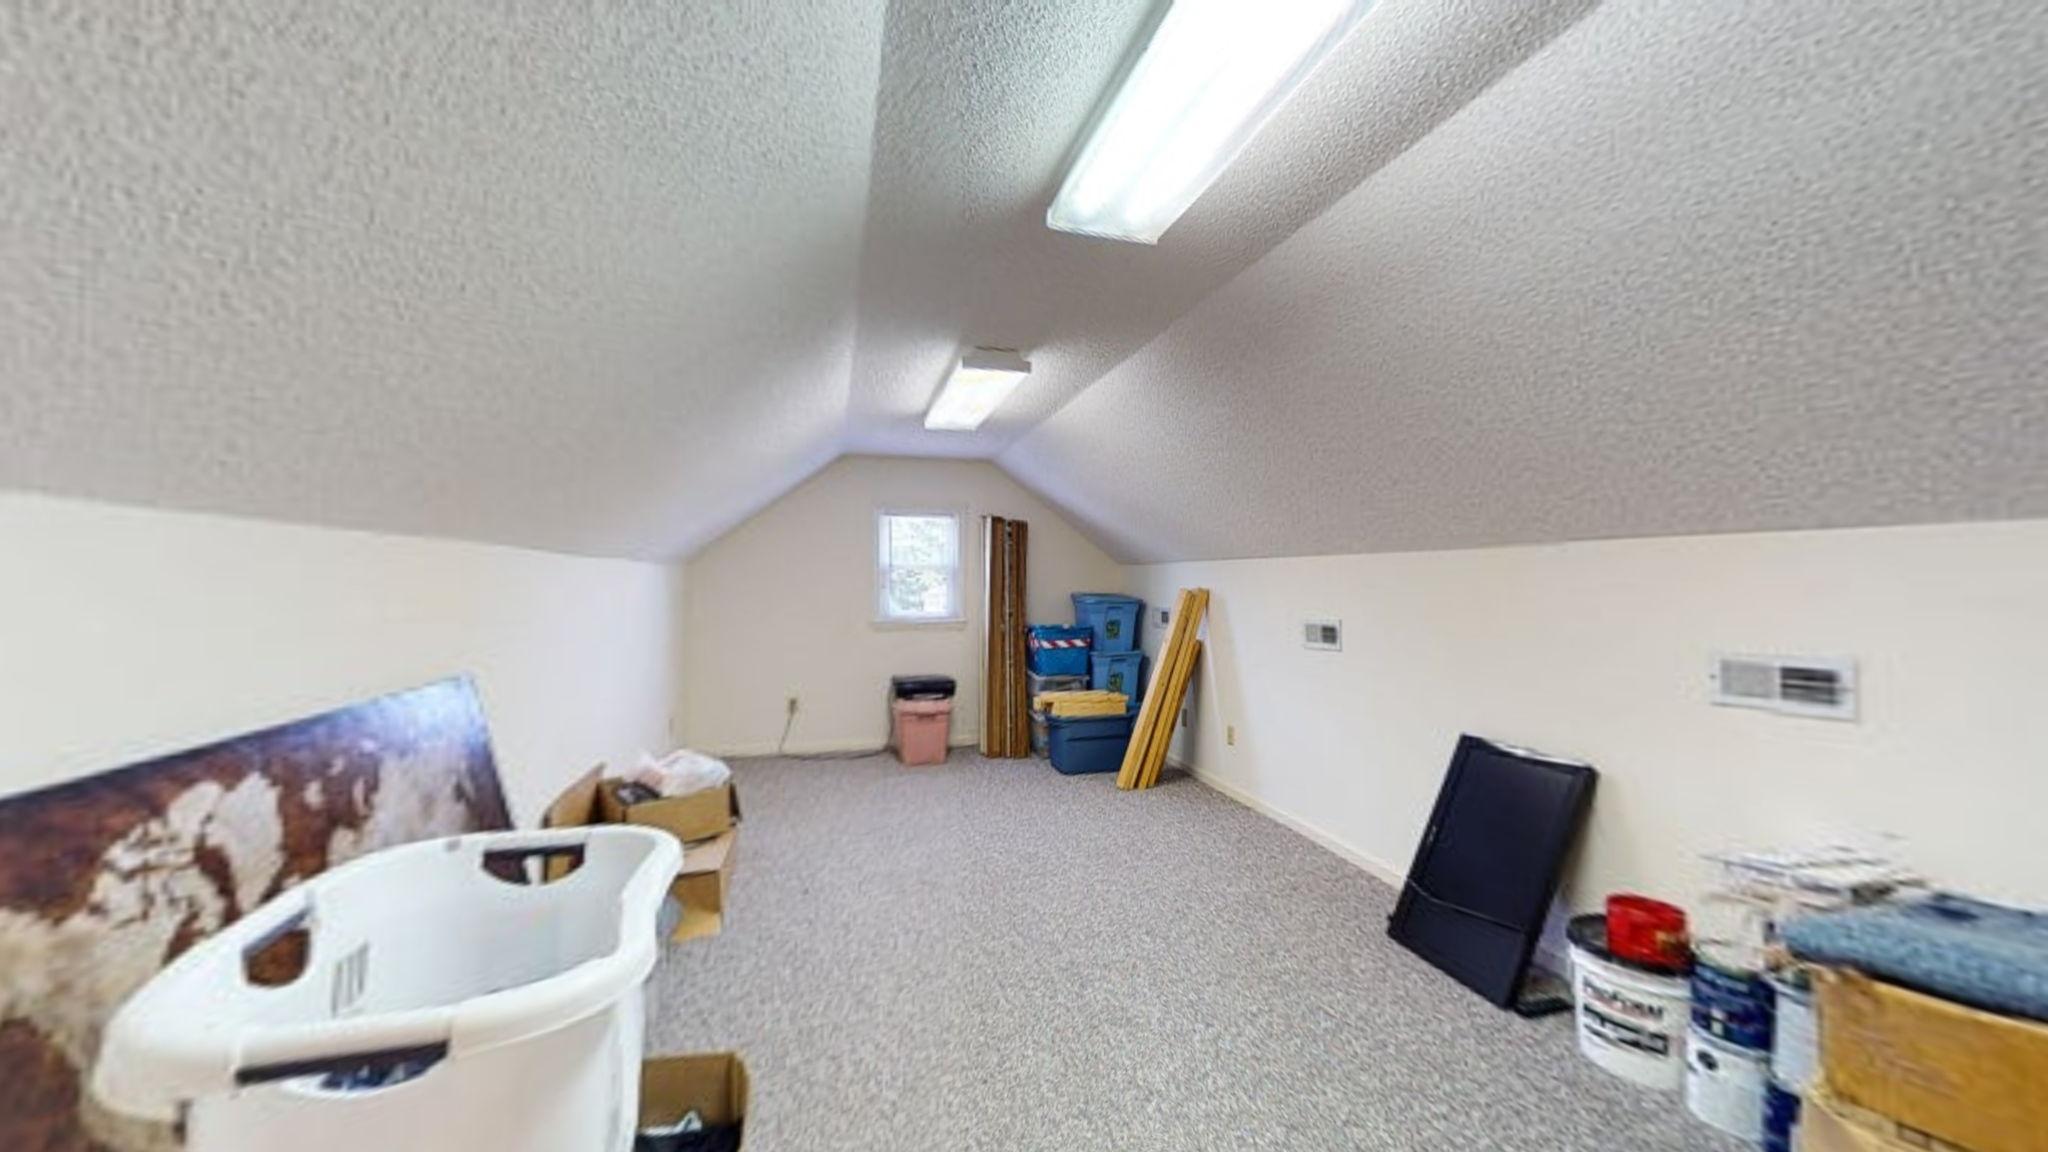 6126 Castleton Ct, New Bern, NC 28560, USA Photo 50